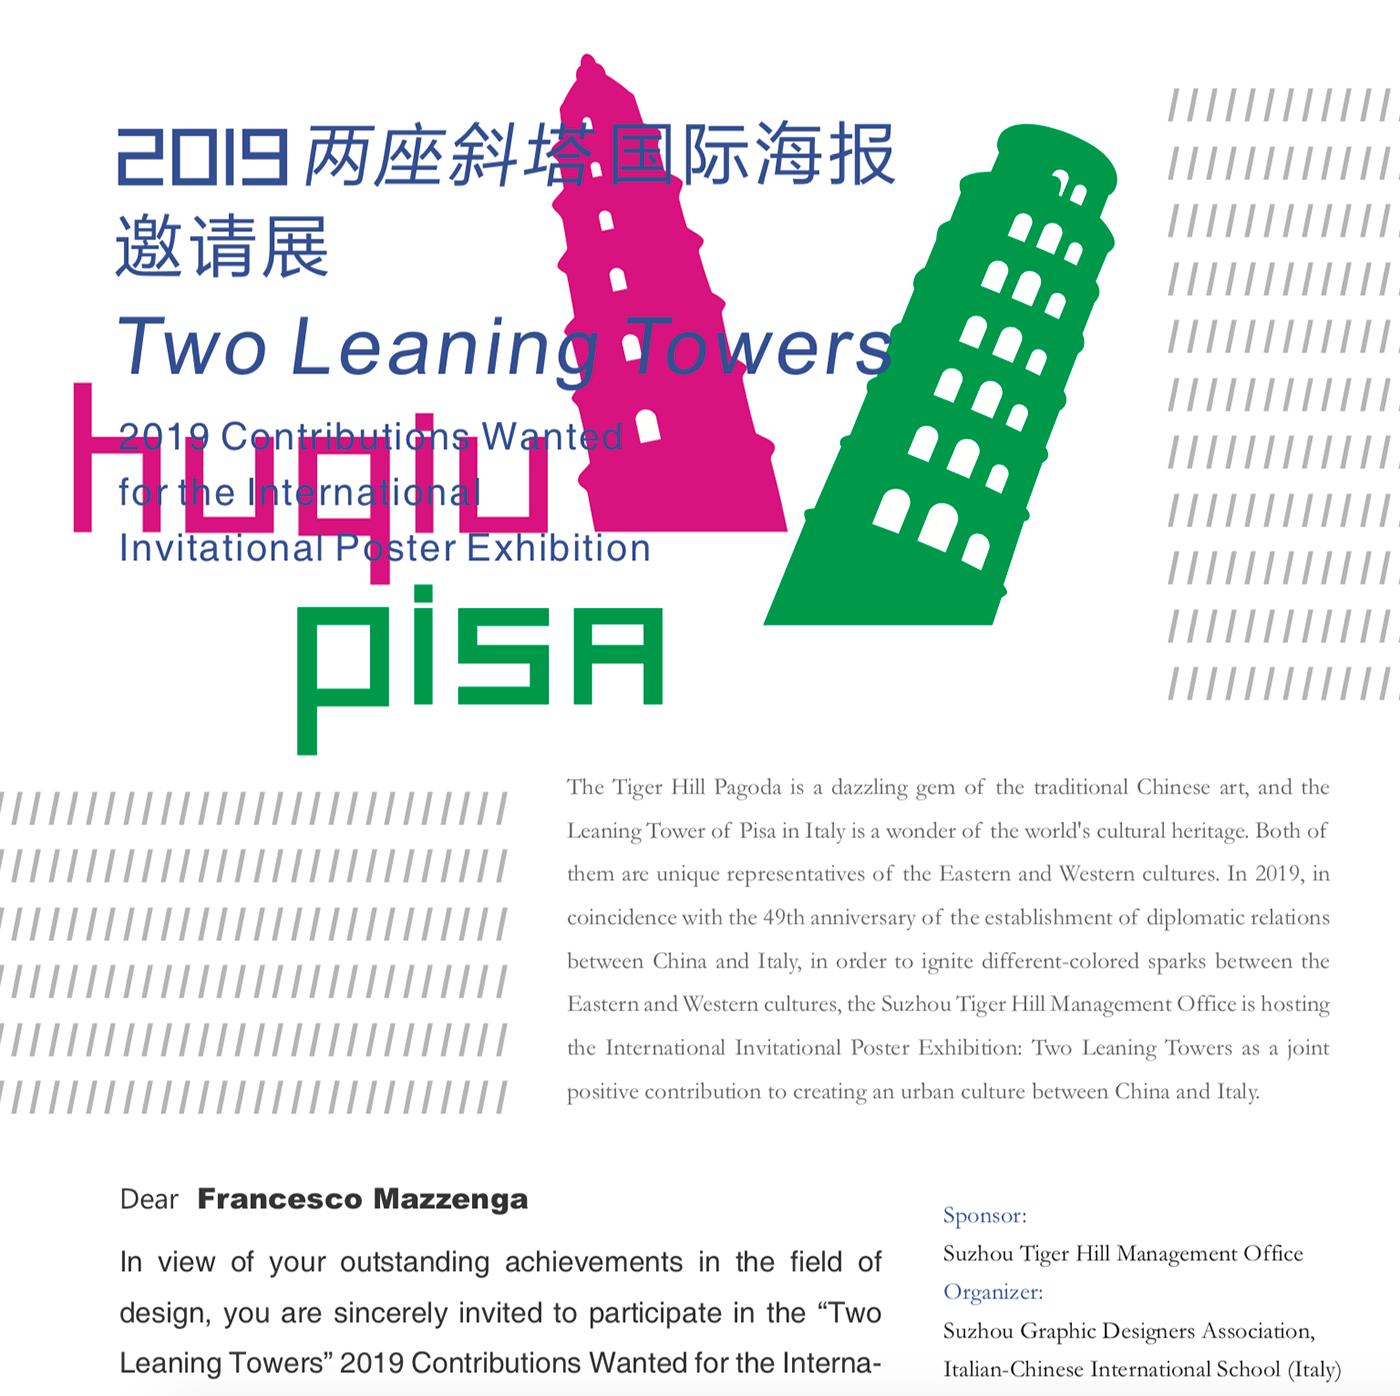 Two Leaning Towers Exhibition 2019 Pisa Exhibition  Poster Design Francesco Mazzenga china cina ILLUSTRATION